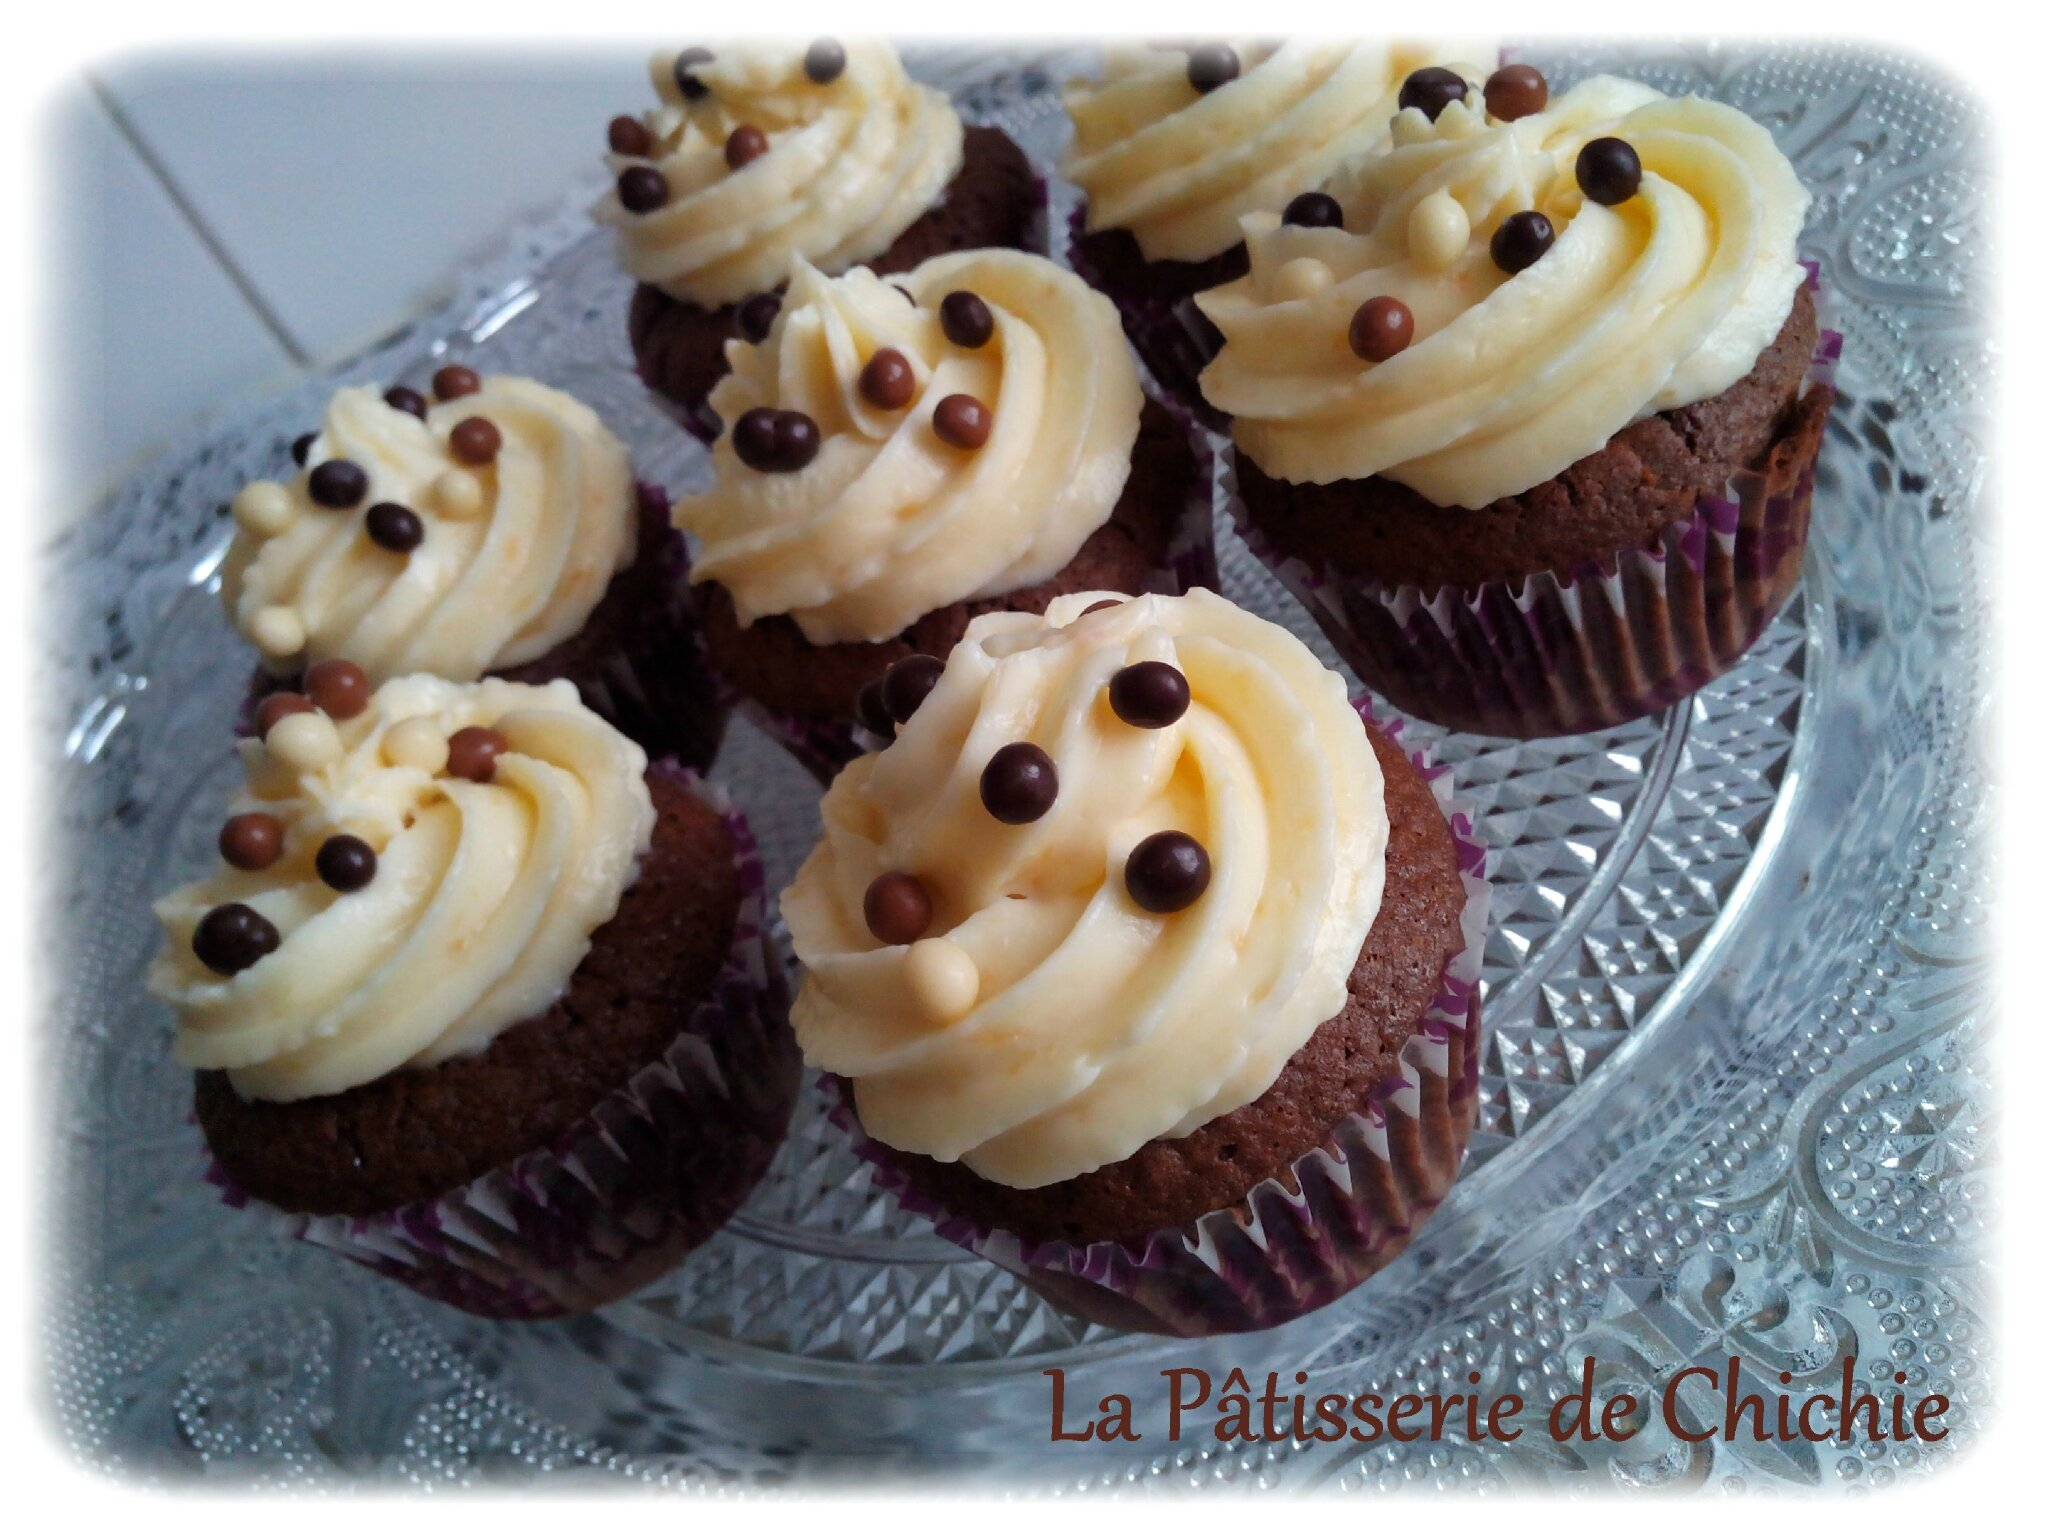 Cupcake et cupcakes...